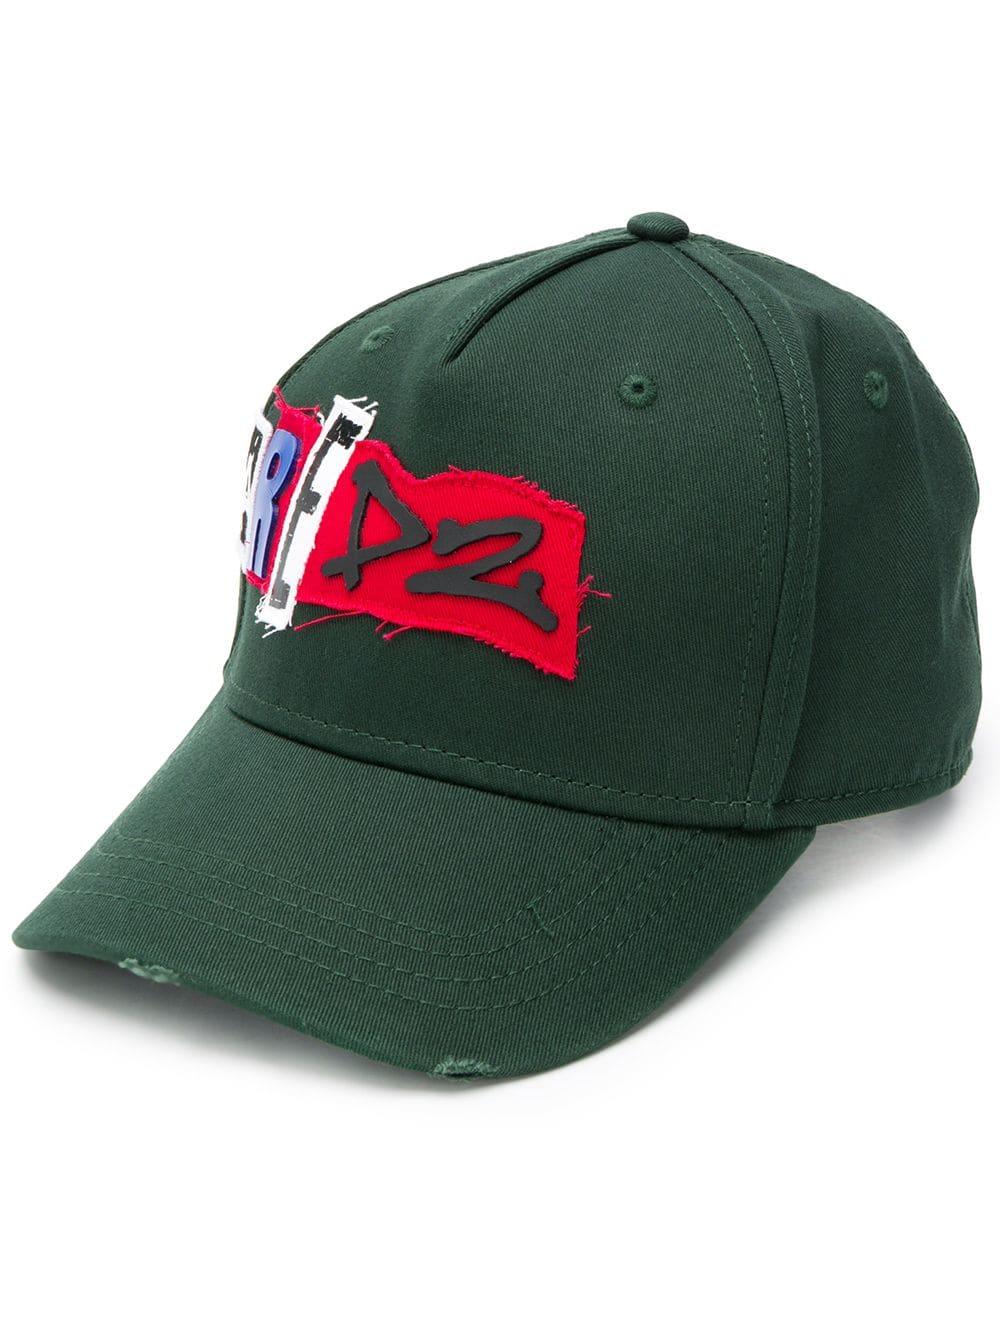 ebab6de330ca6 Dsquared2 Baseball Cap With Applications - DSQUARED2 - Russocapri